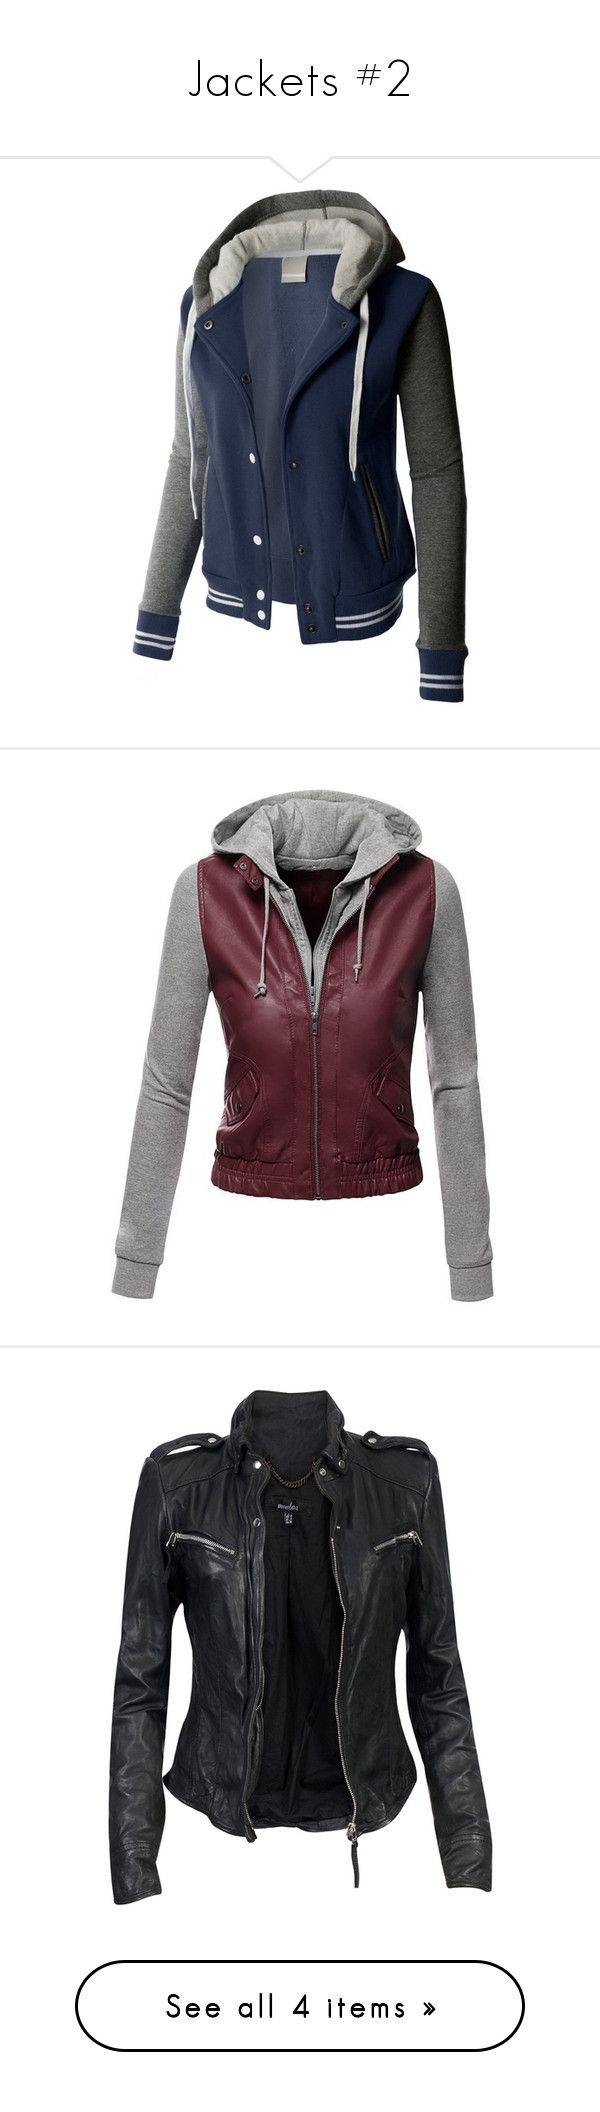 """Jackets #2"" by aj-the-creepypasta ❤ liked on Polyvore featuring outerwear, jackets, jacket's, hooded baseball jacket, slim fit jackets, stripe jacket, blue baseball jacket, fleece baseball jacket, tops and jackets/vests"